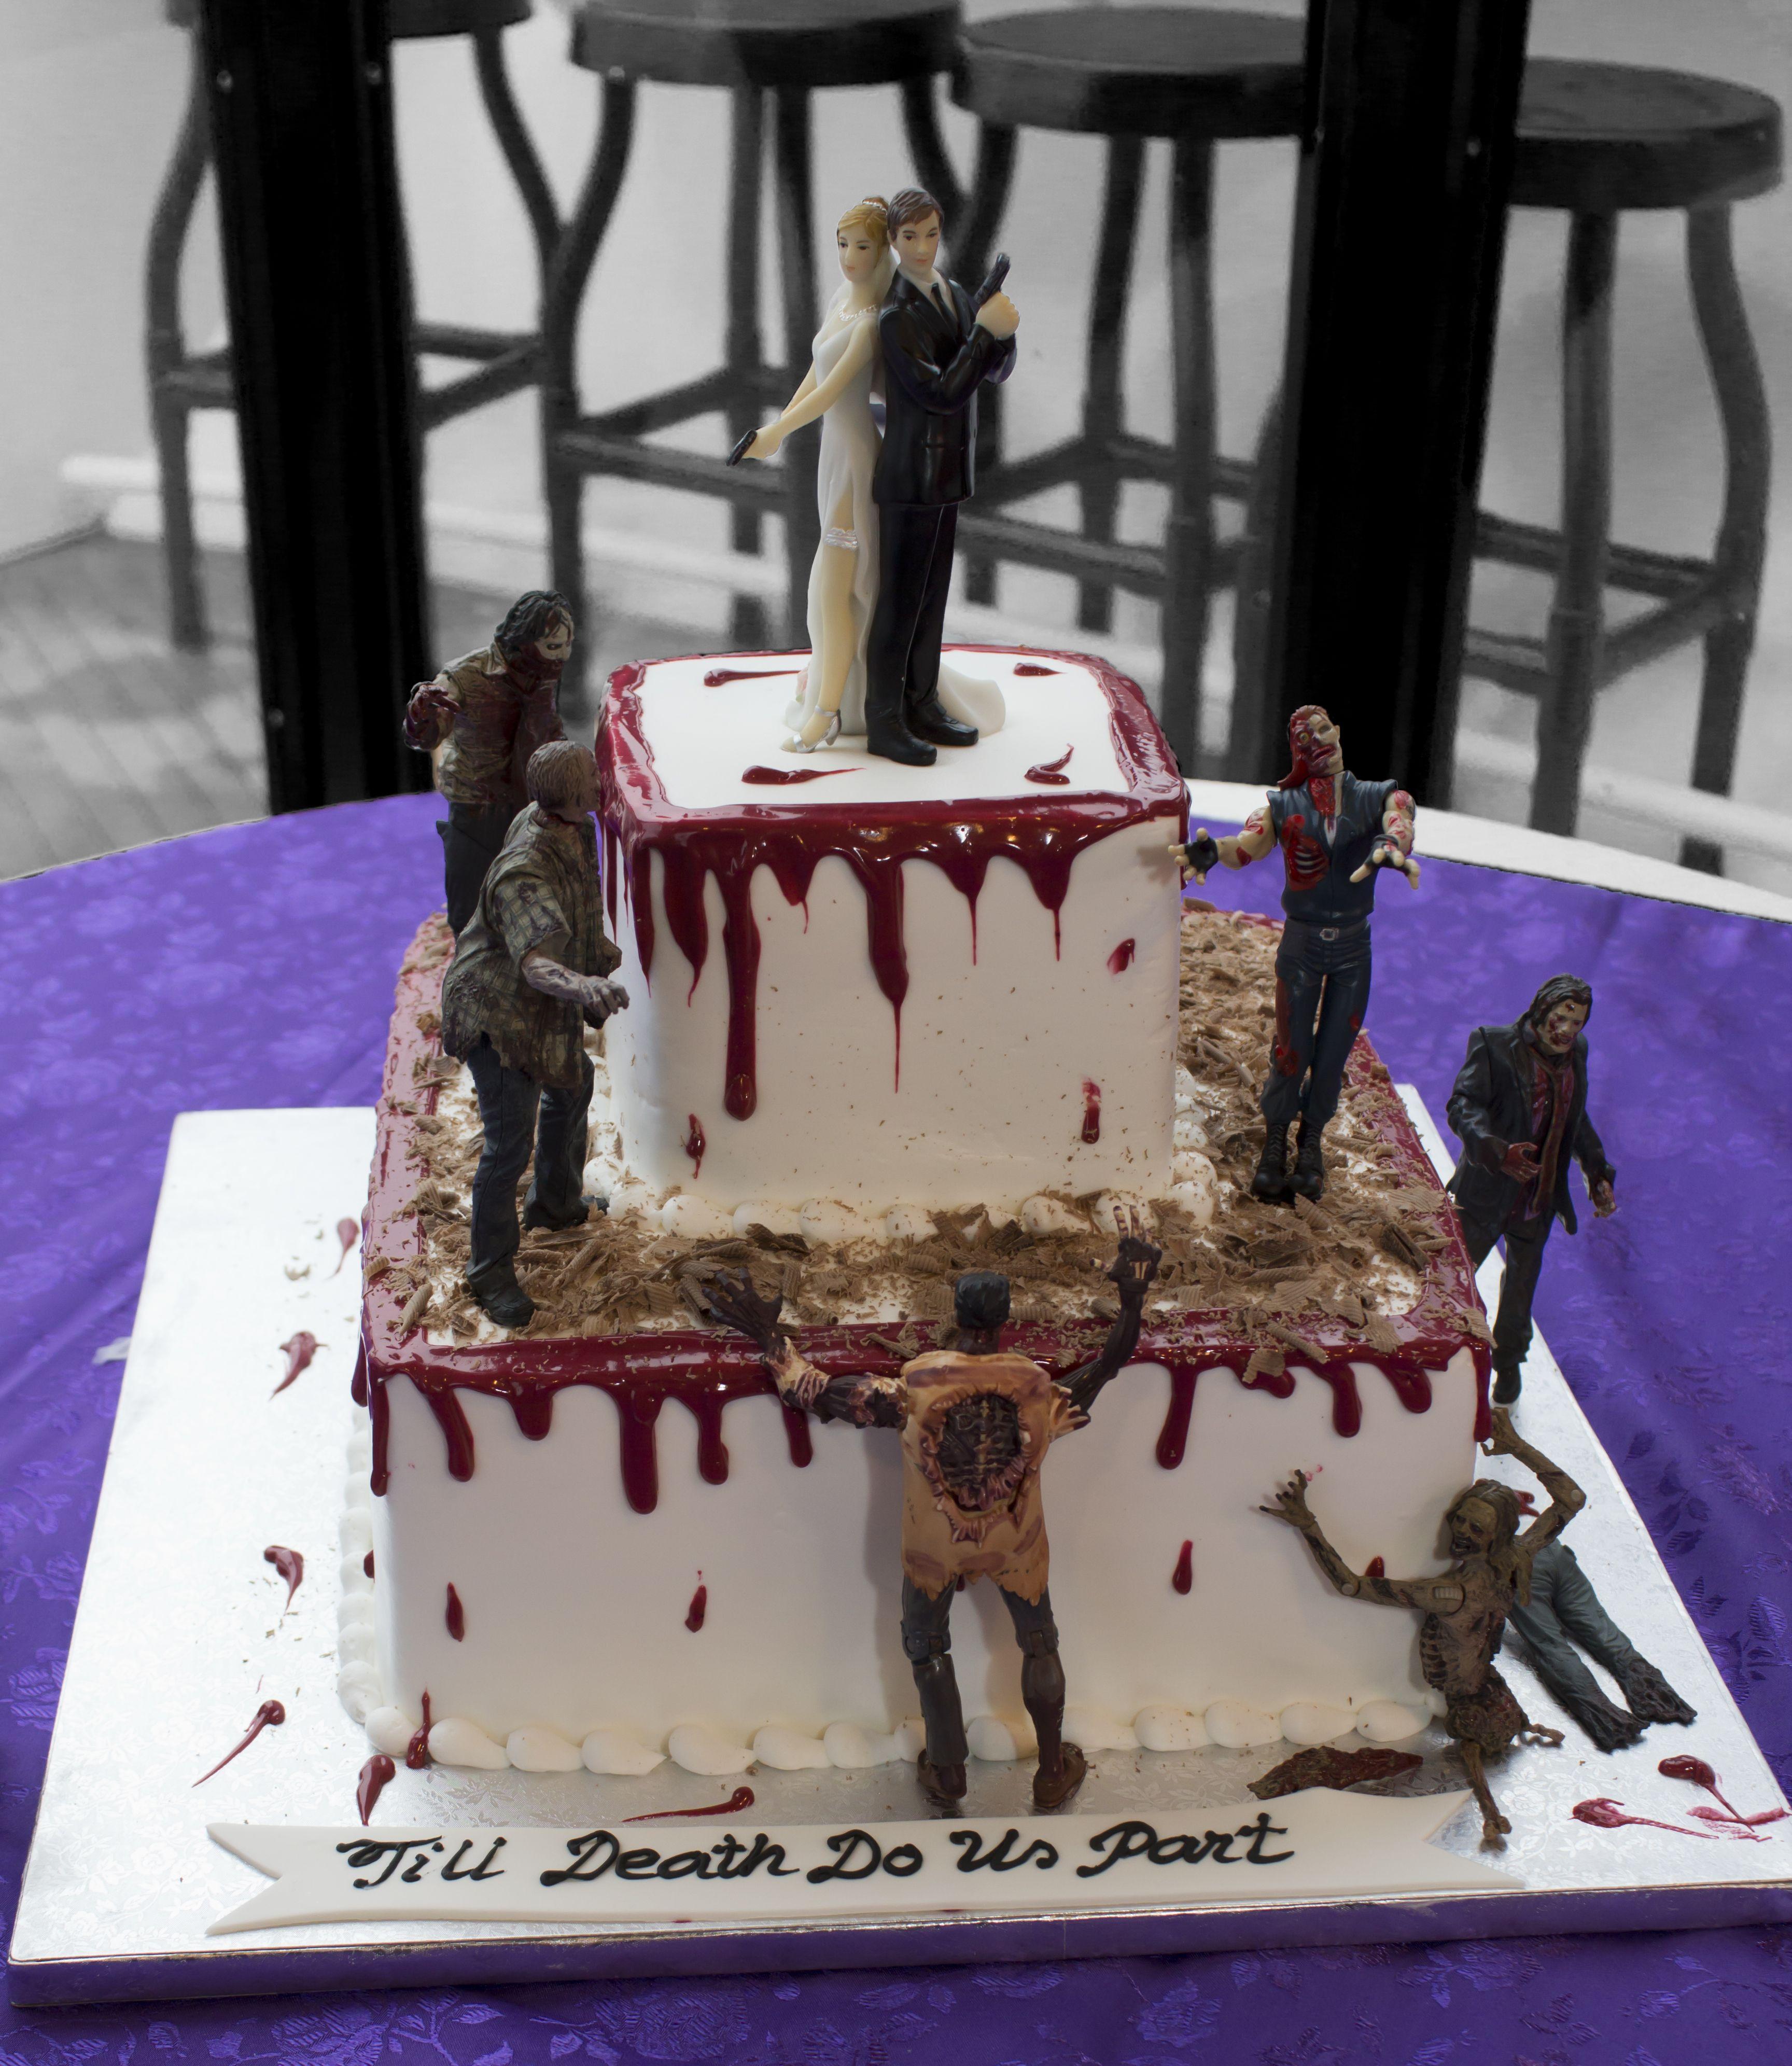 Grooms Wedding Cake Ideas: My Purple Wedding--Grooms Zombie Cake. He Designed This